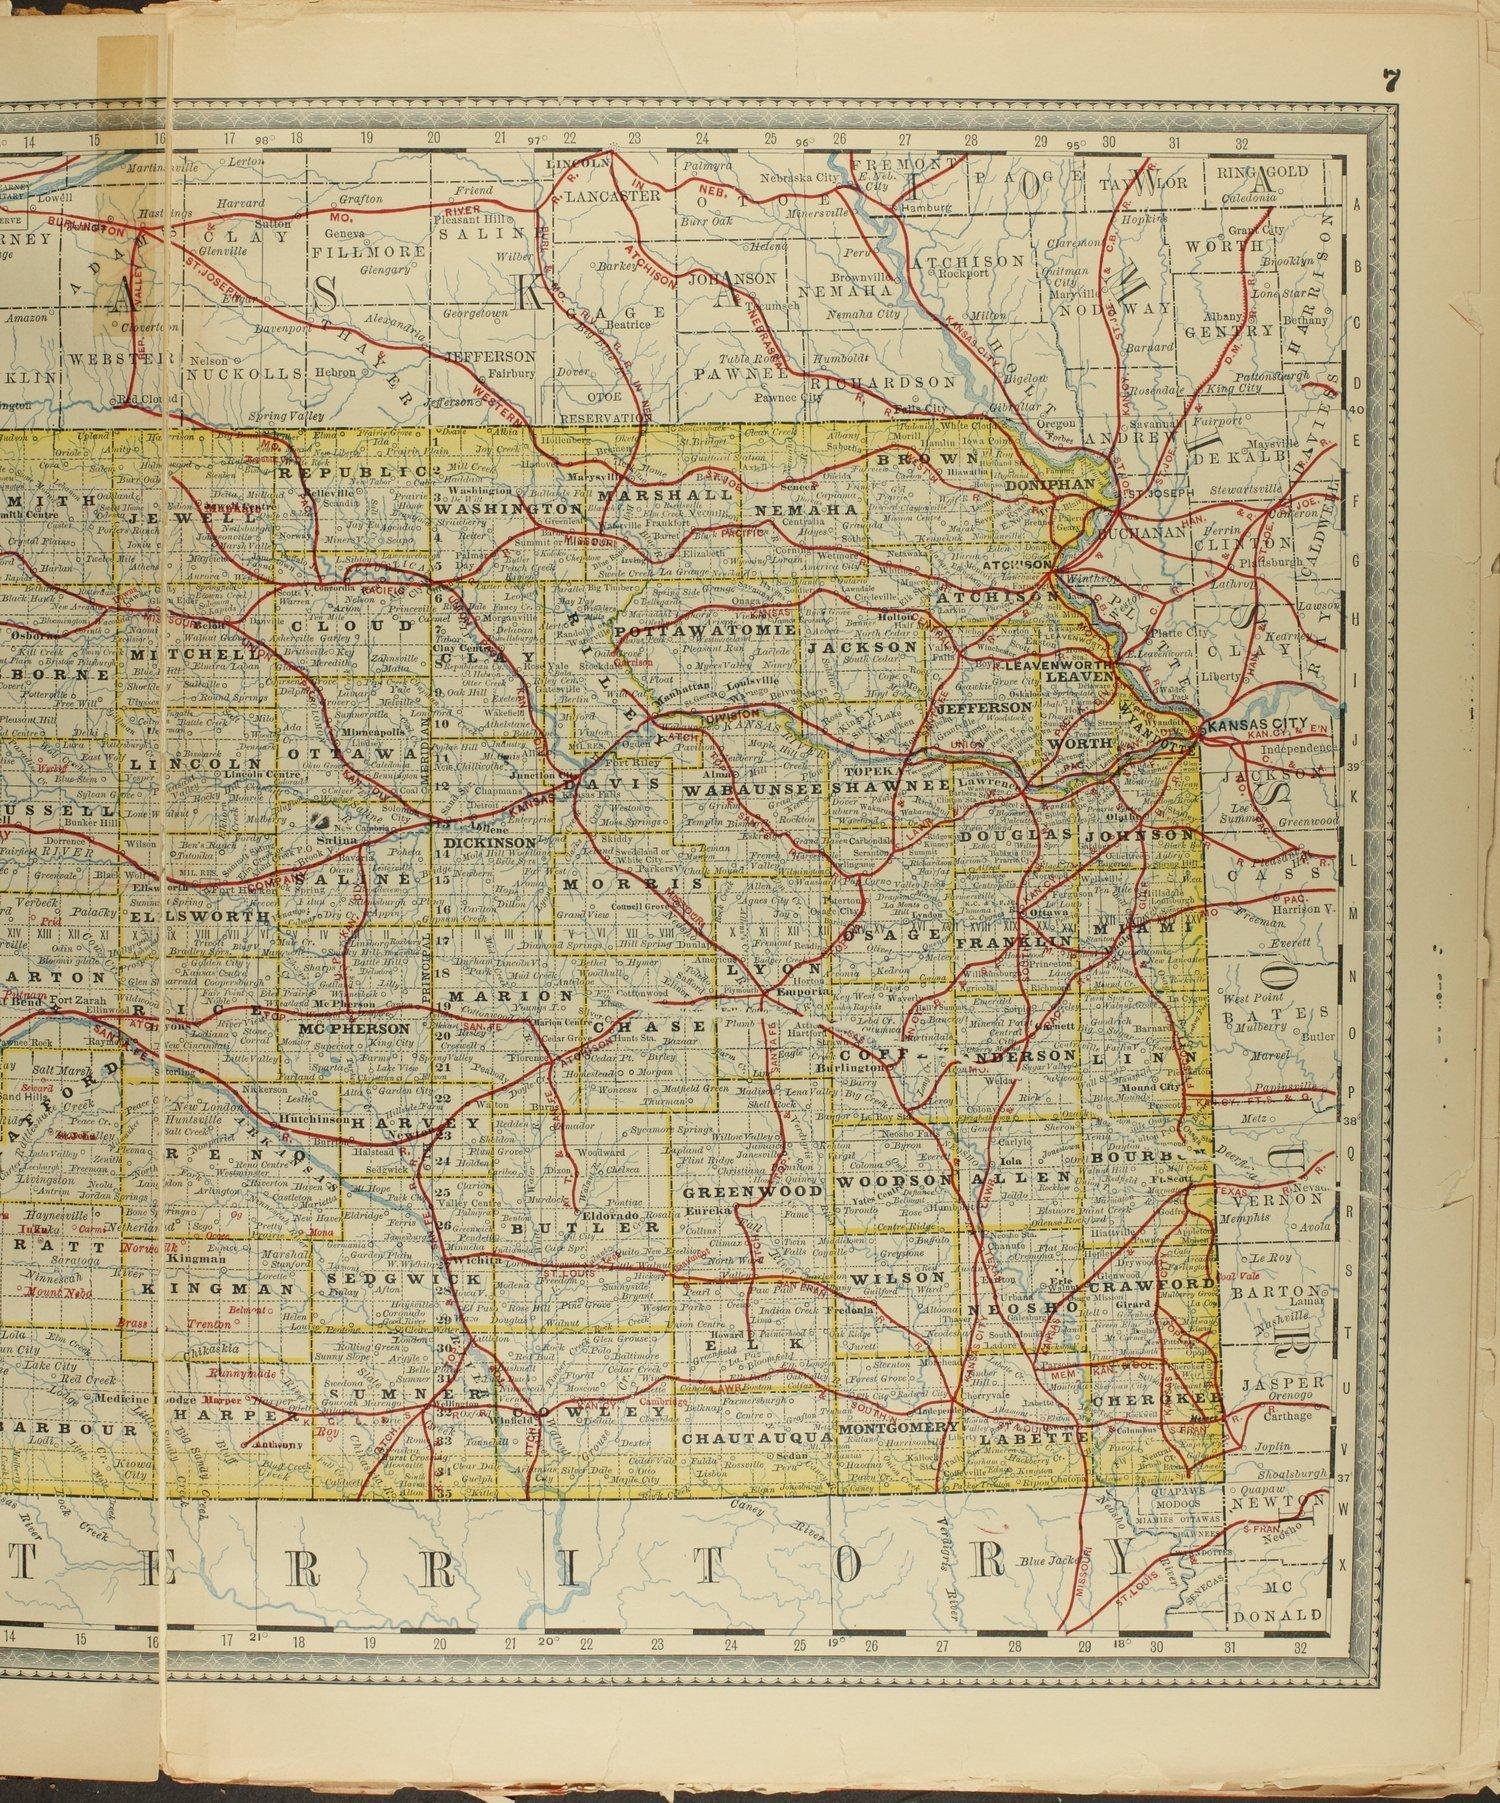 Historical plat book of Clay County, Kansas - Map of Kansas